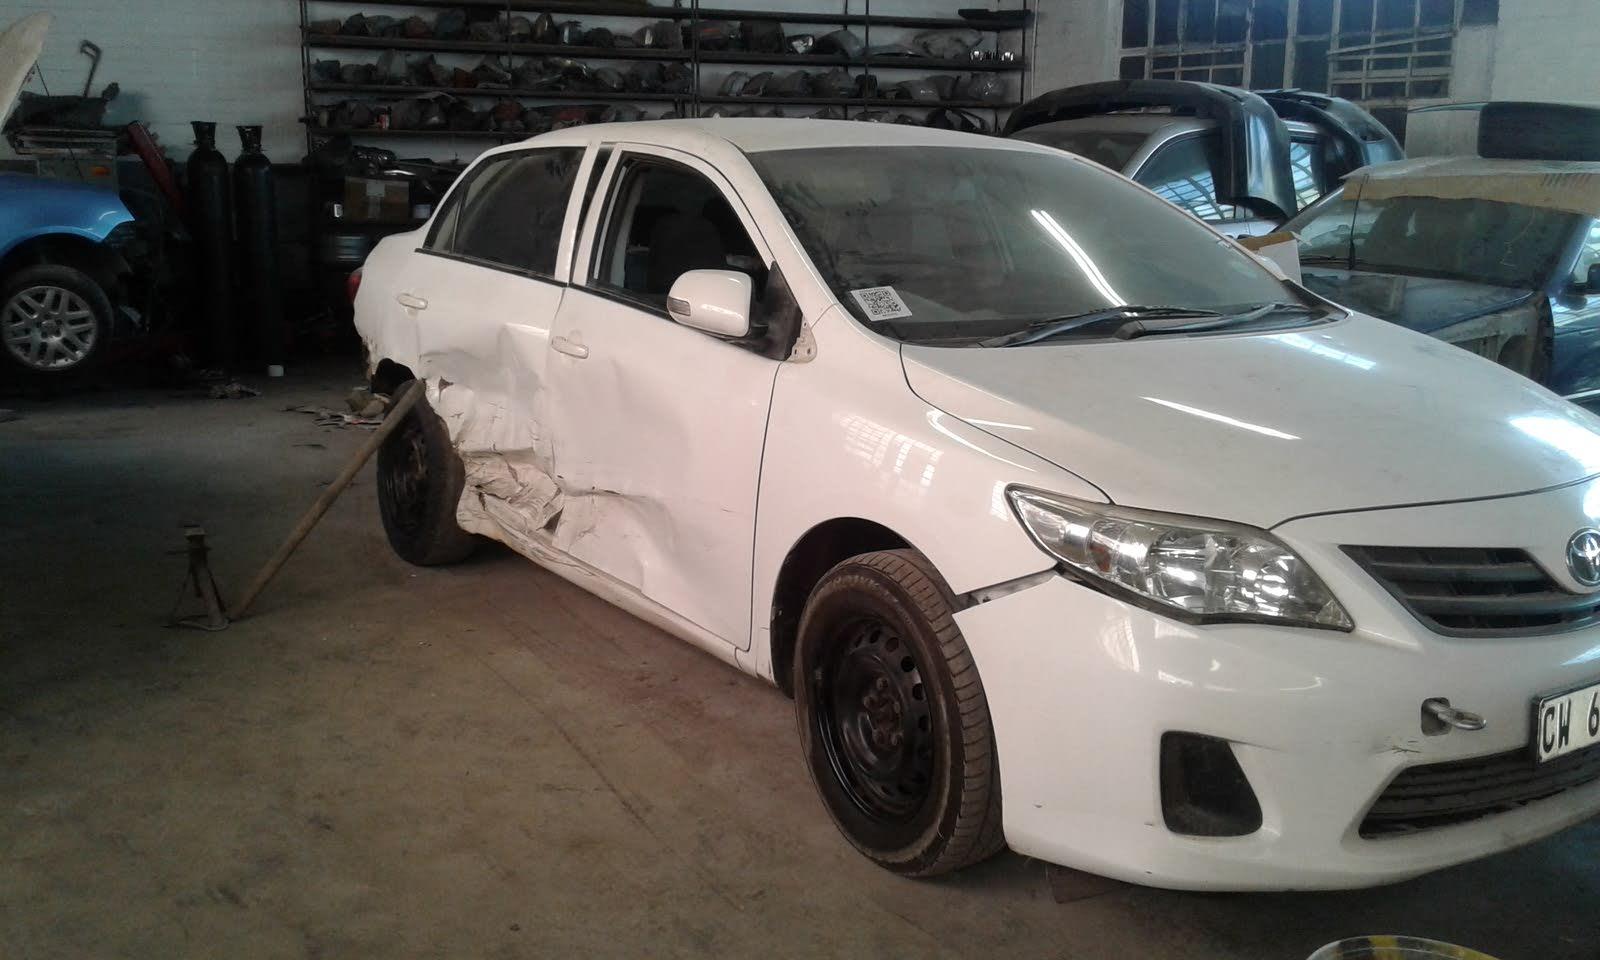 Toyota Corolla Questions - 2014 Corrola won't start after